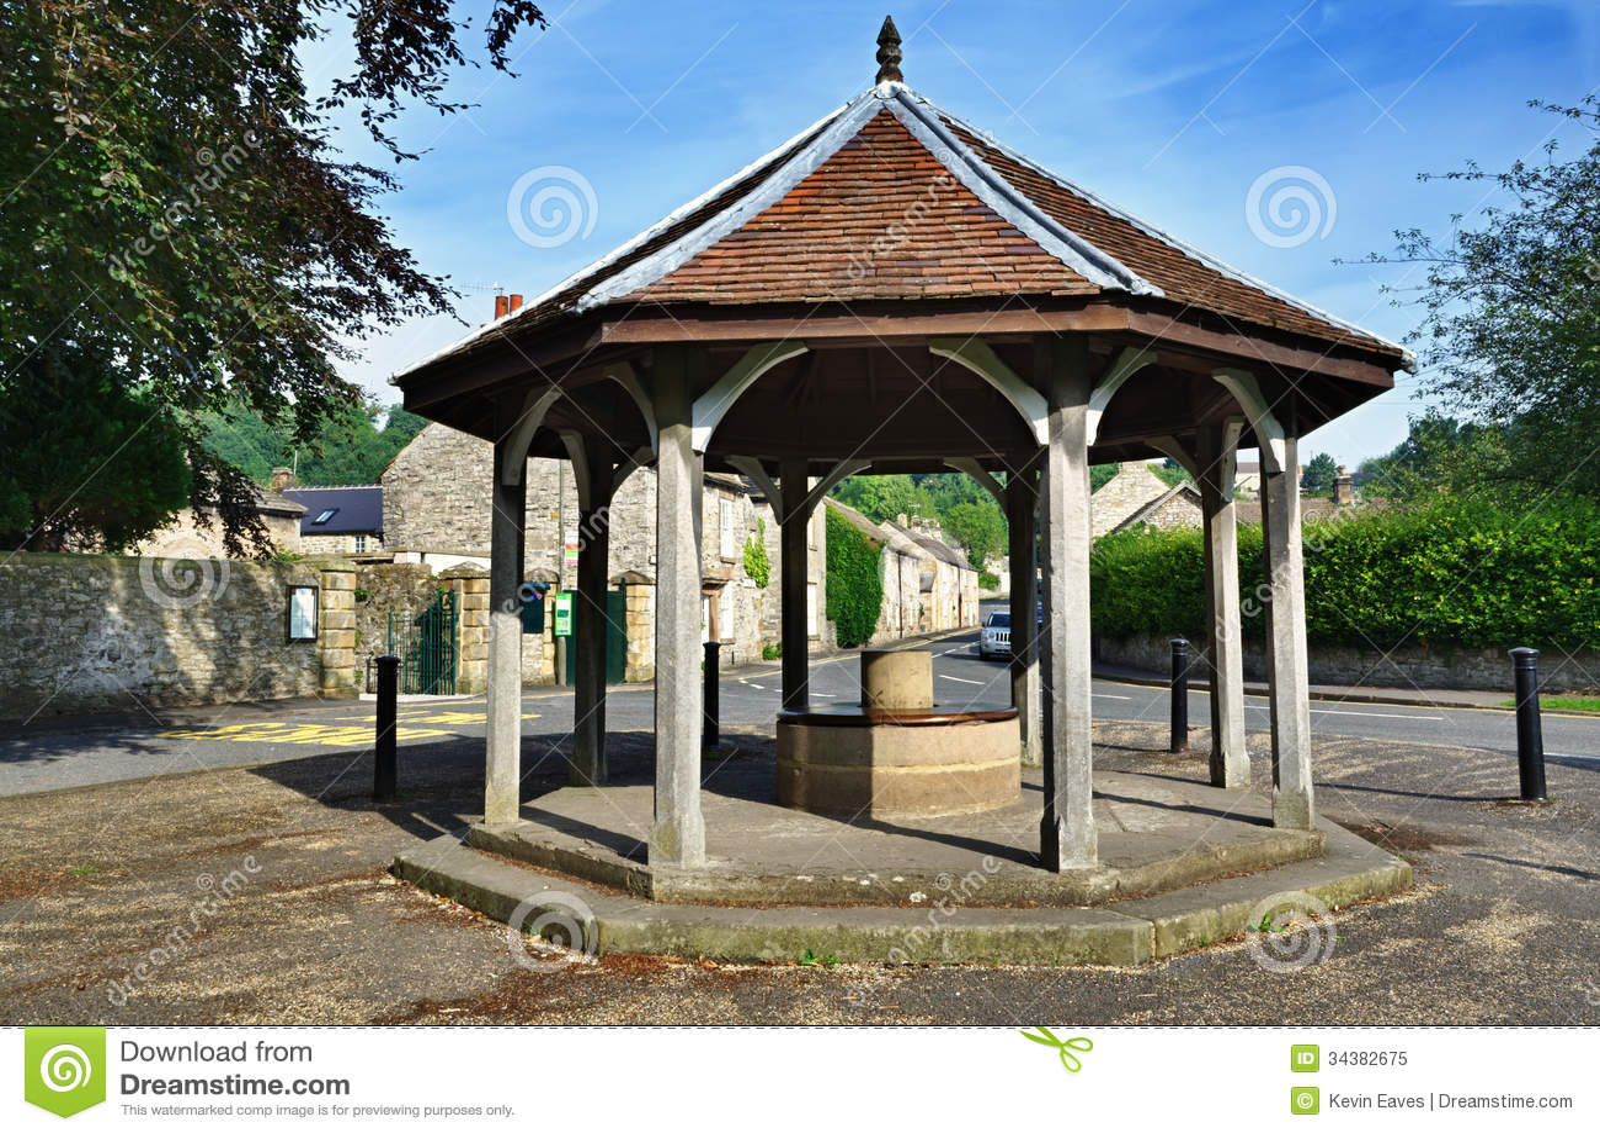 Bandstand w wodzie, Derbyshire